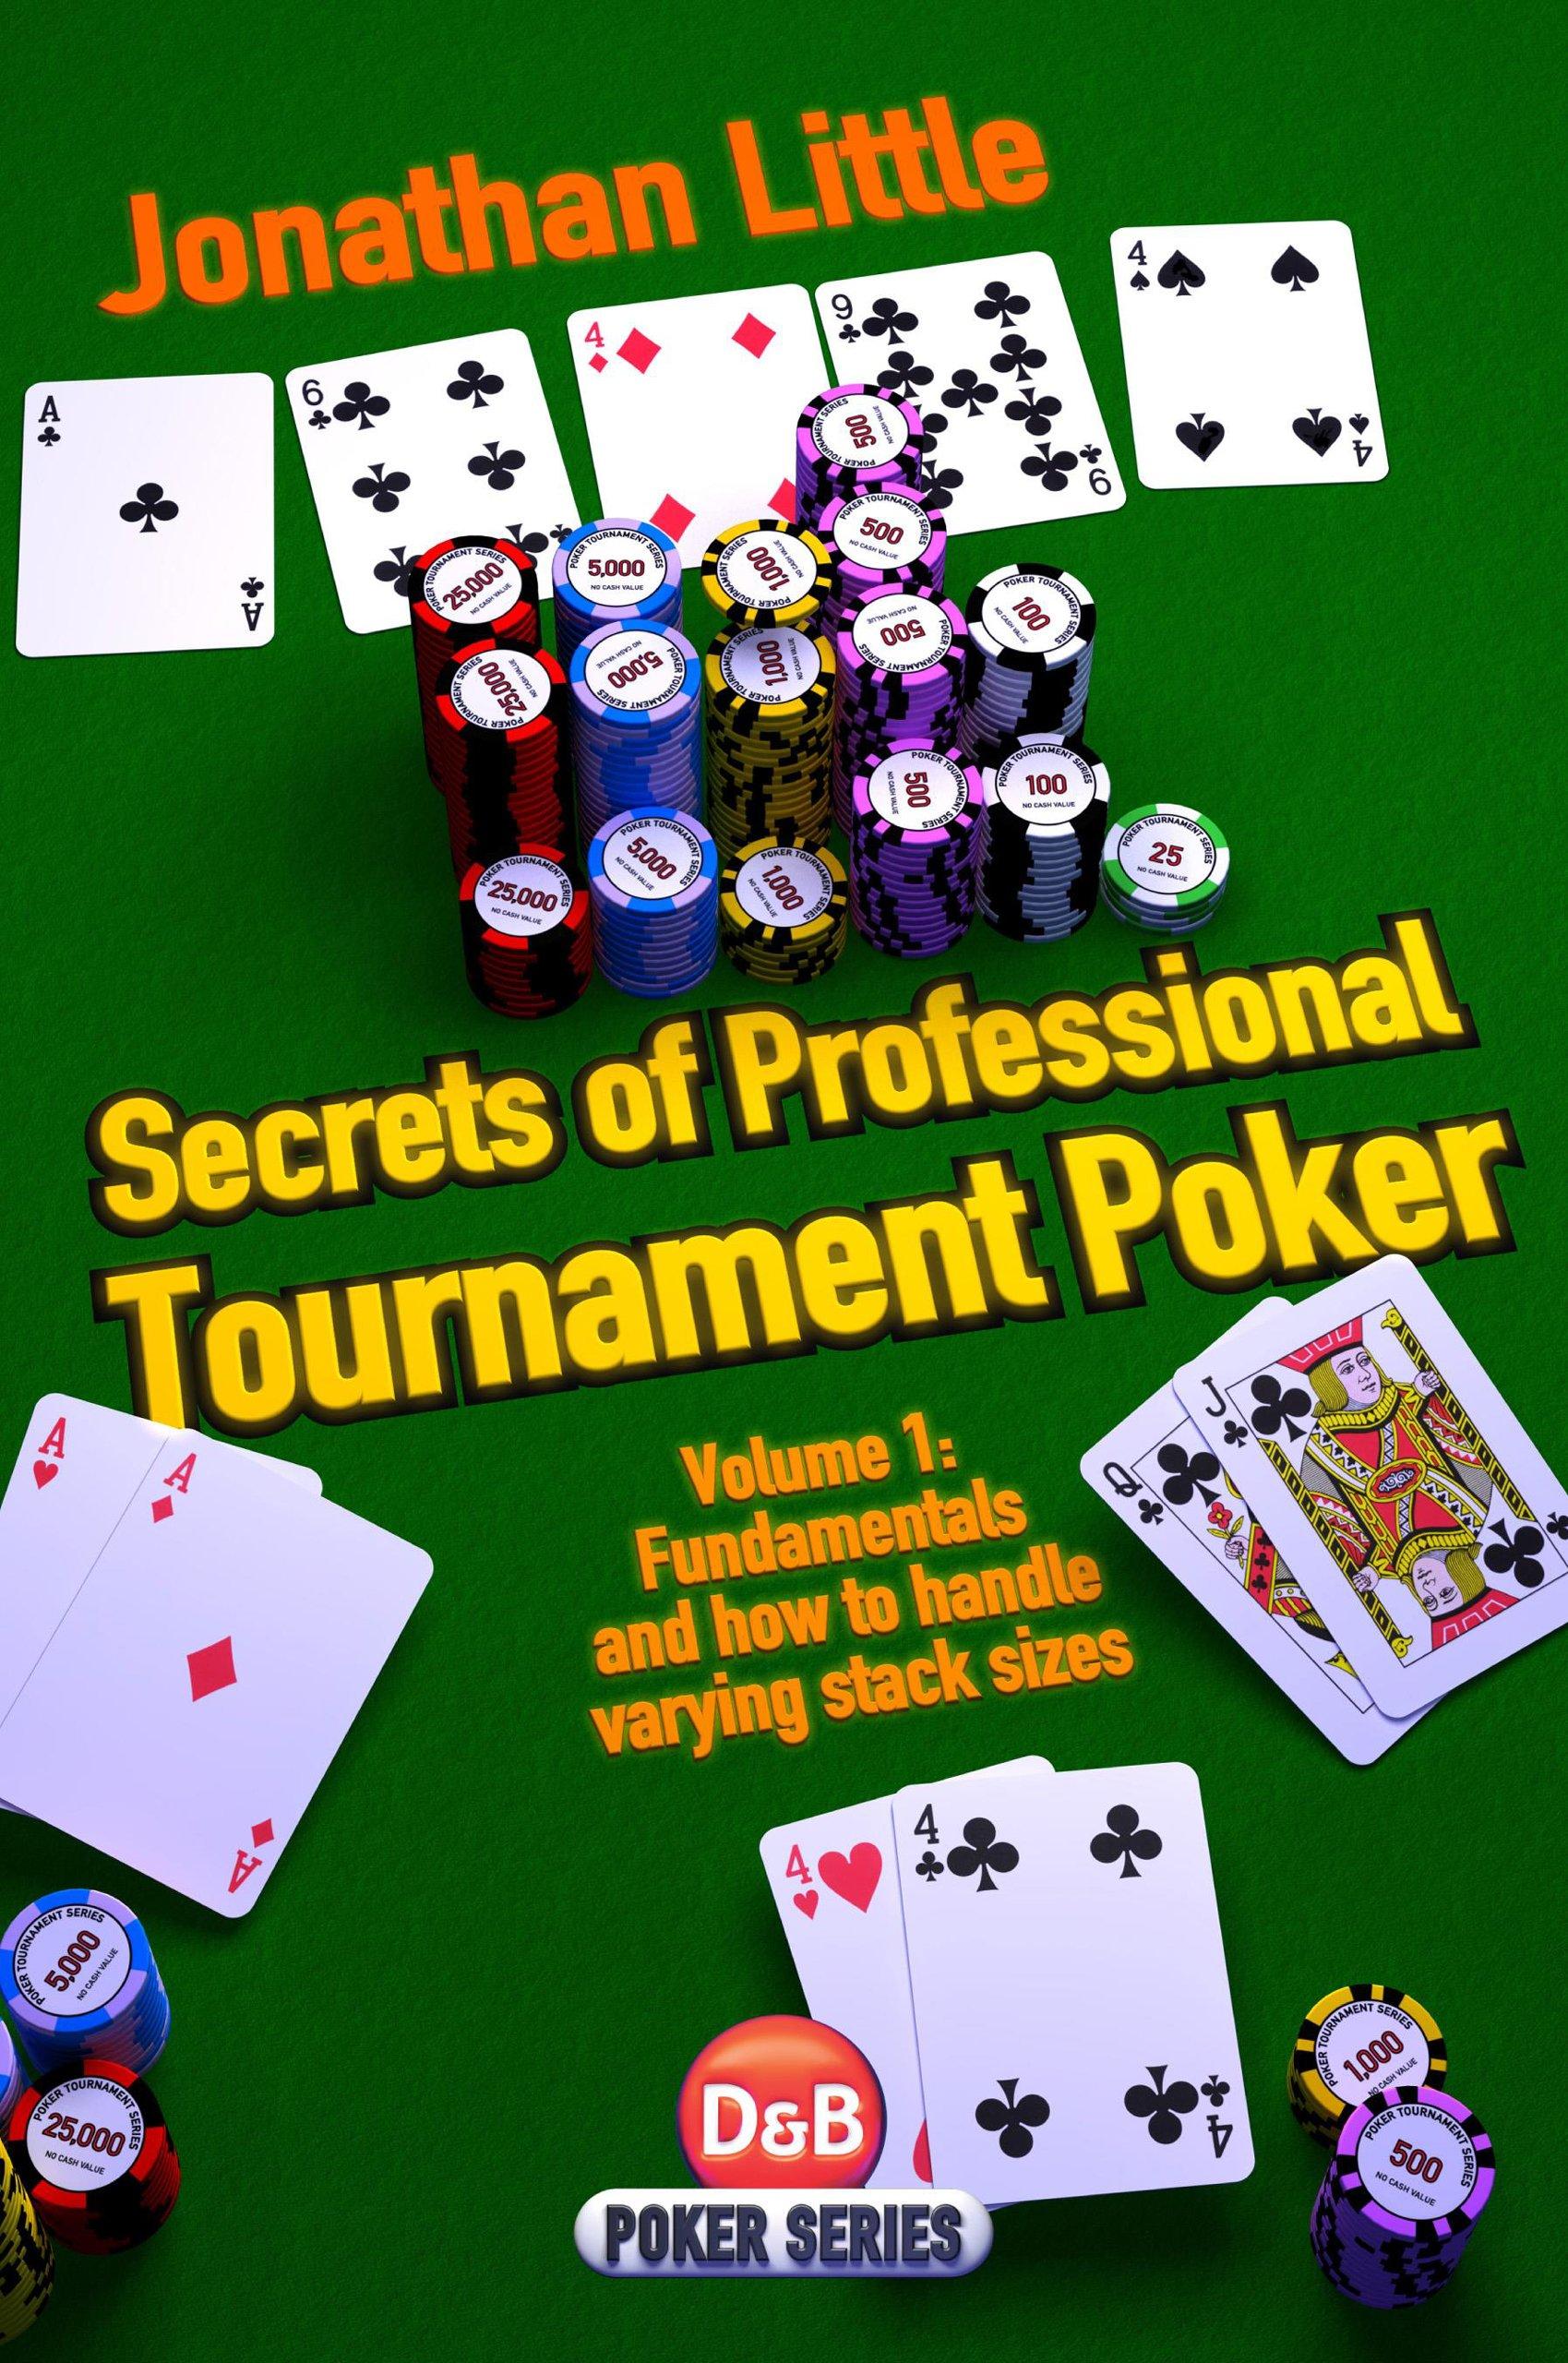 Secrets of Professional Tournament Poker (D&B Poker) (Volume 1)